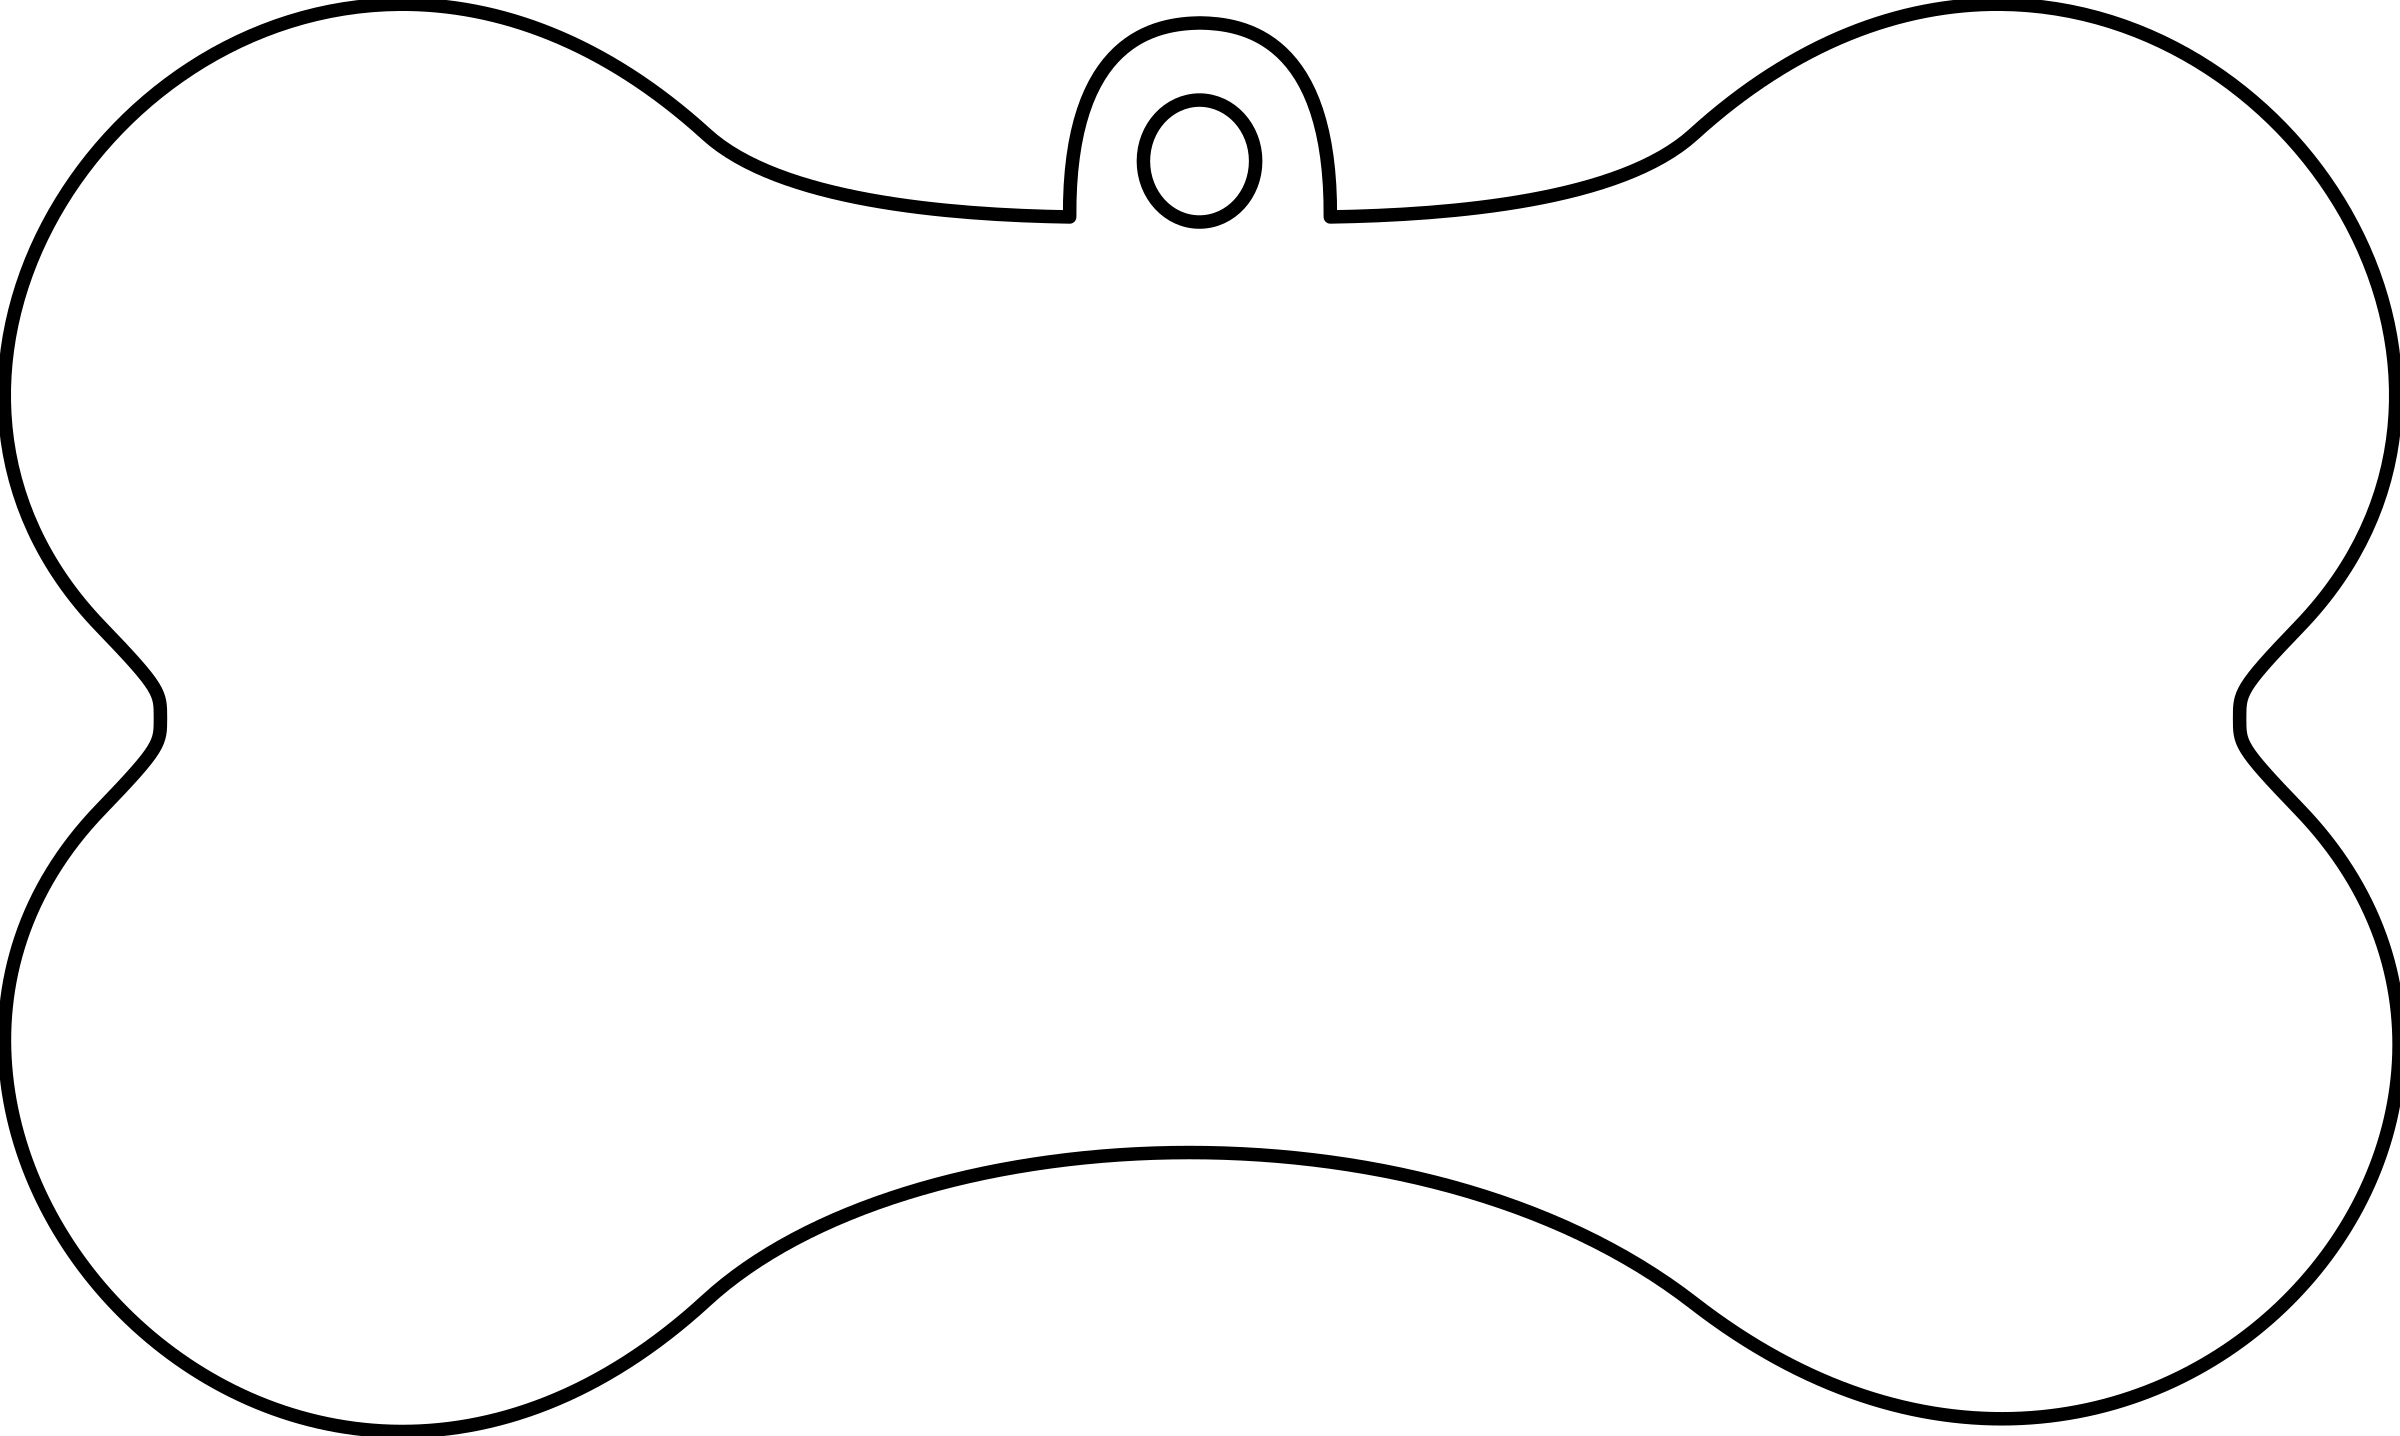 2400x1436 Clipart